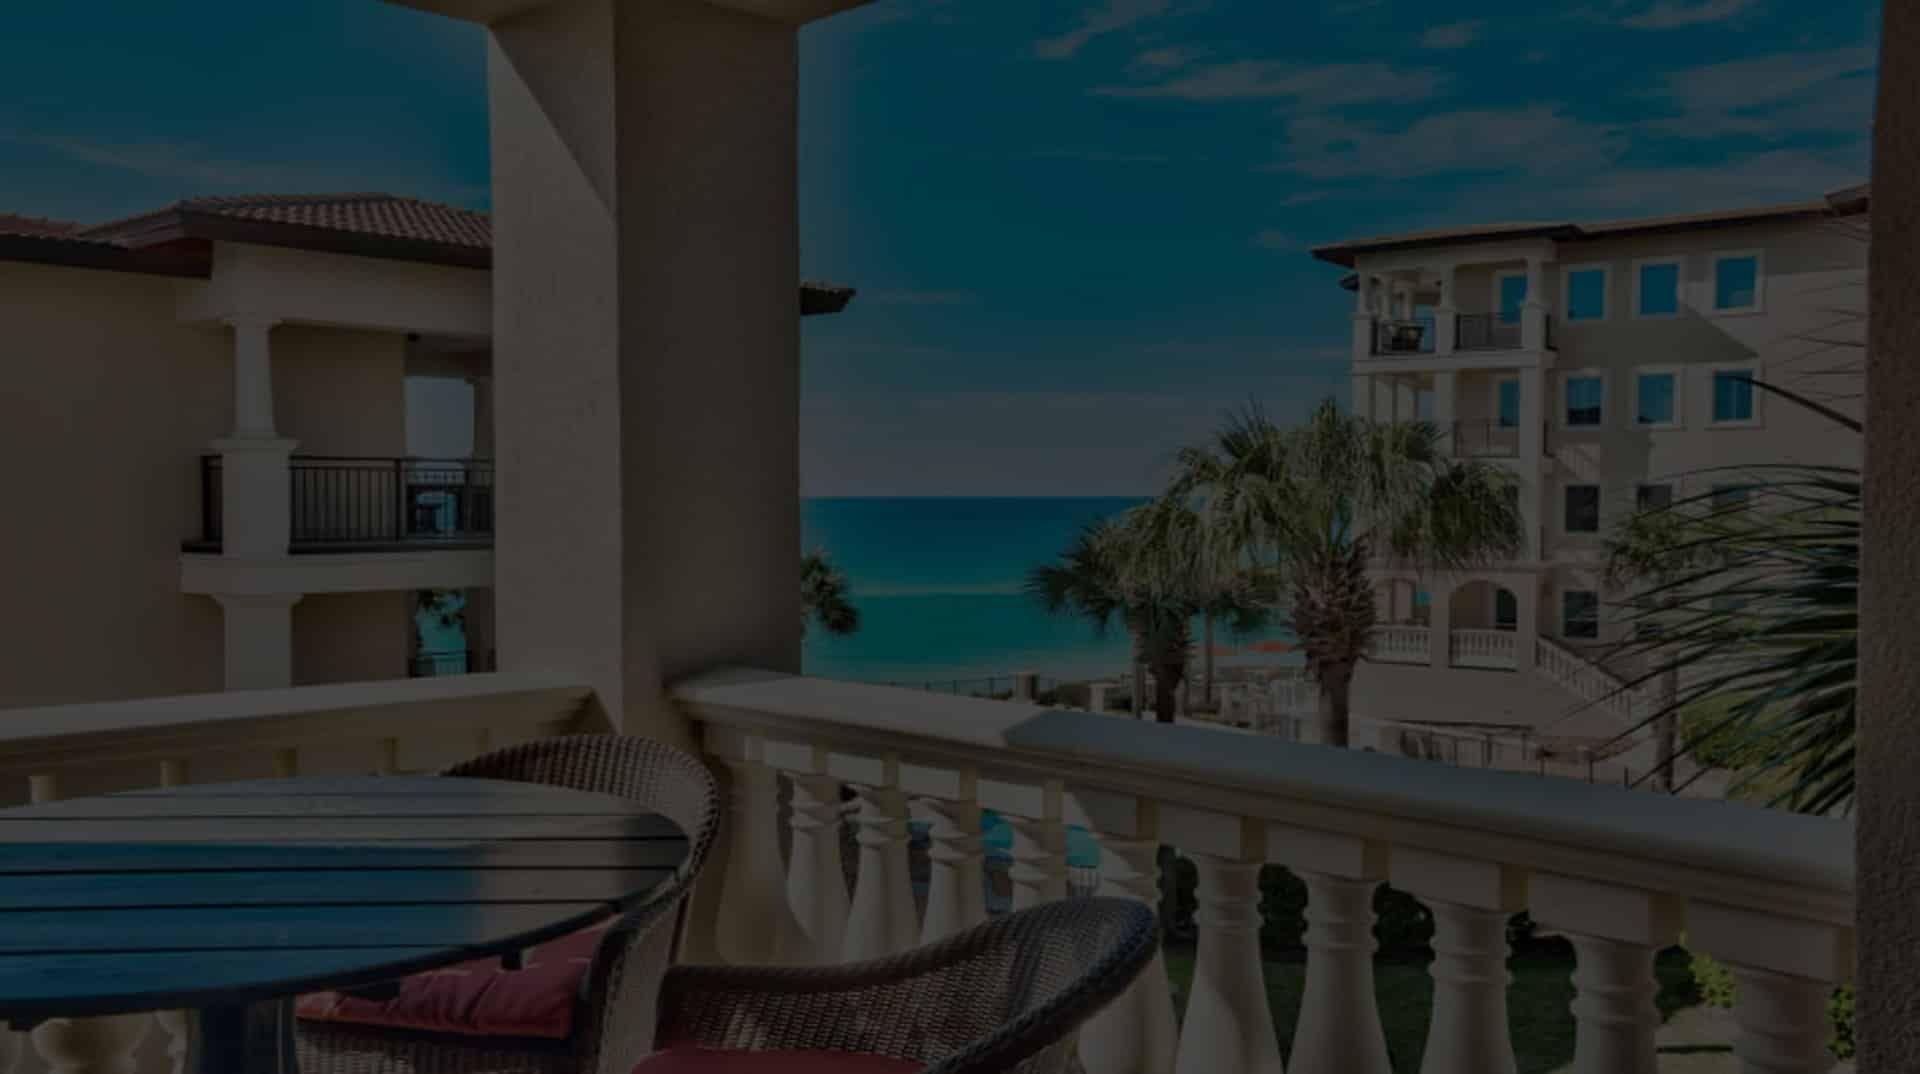 santa rosa beach condo, santa rosa beach condo mortgage, santa rosa beach condo mortgage rates, santa rosa beach condo mortgage broker, santa rosa beach condo mortgage lender, mortgage broker near me,